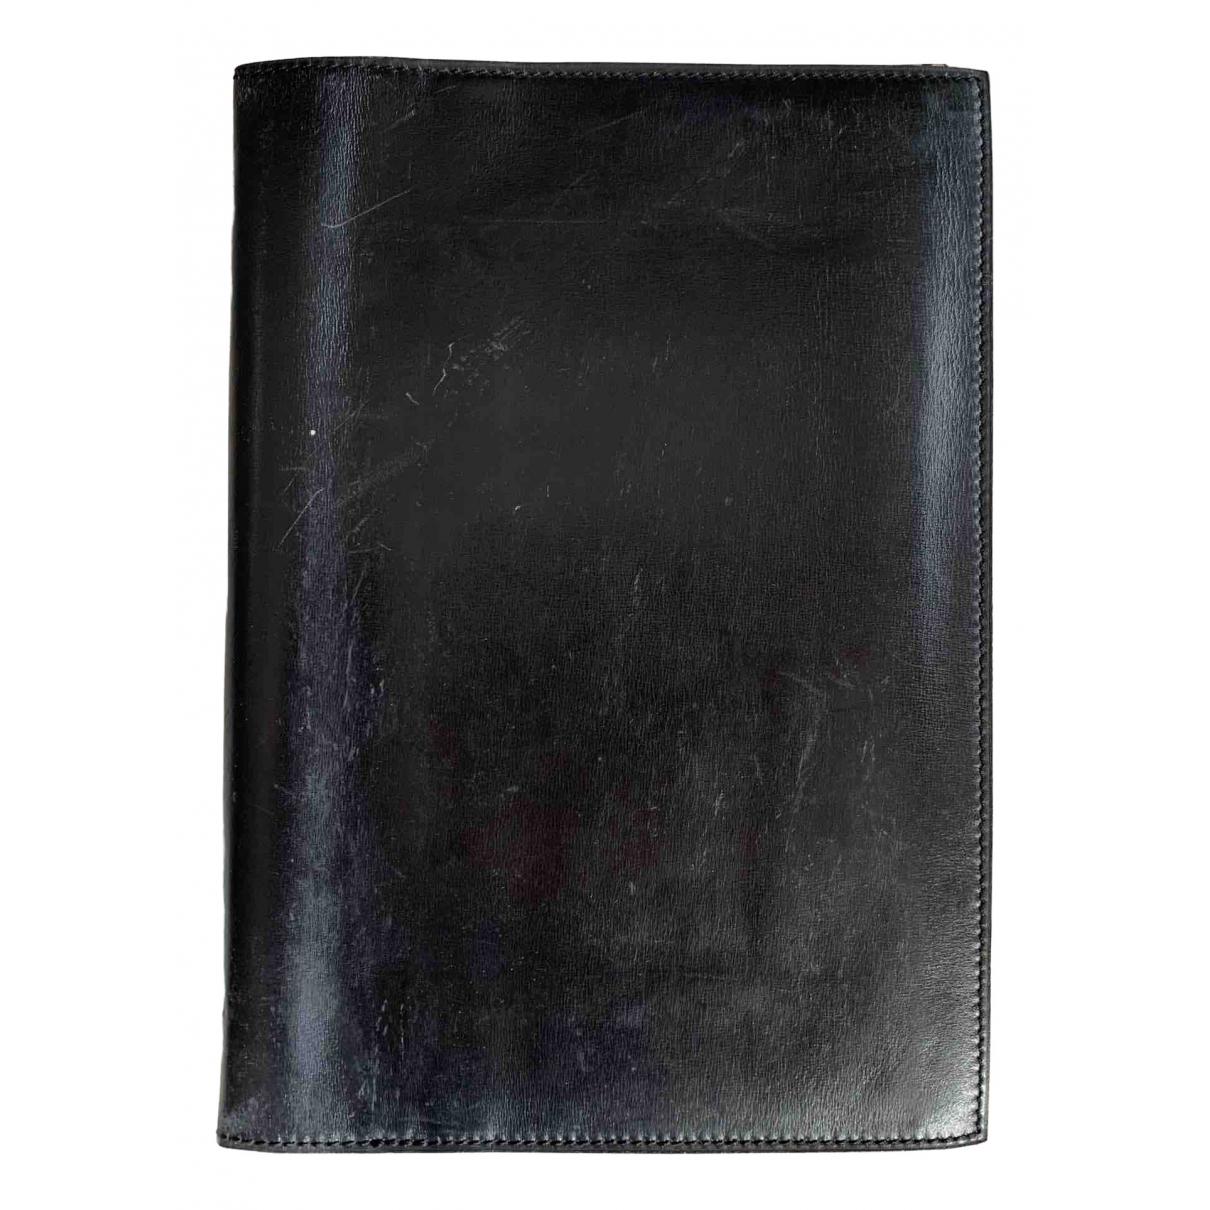 Delvaux N Black Leather Purses, wallet & cases for Women N